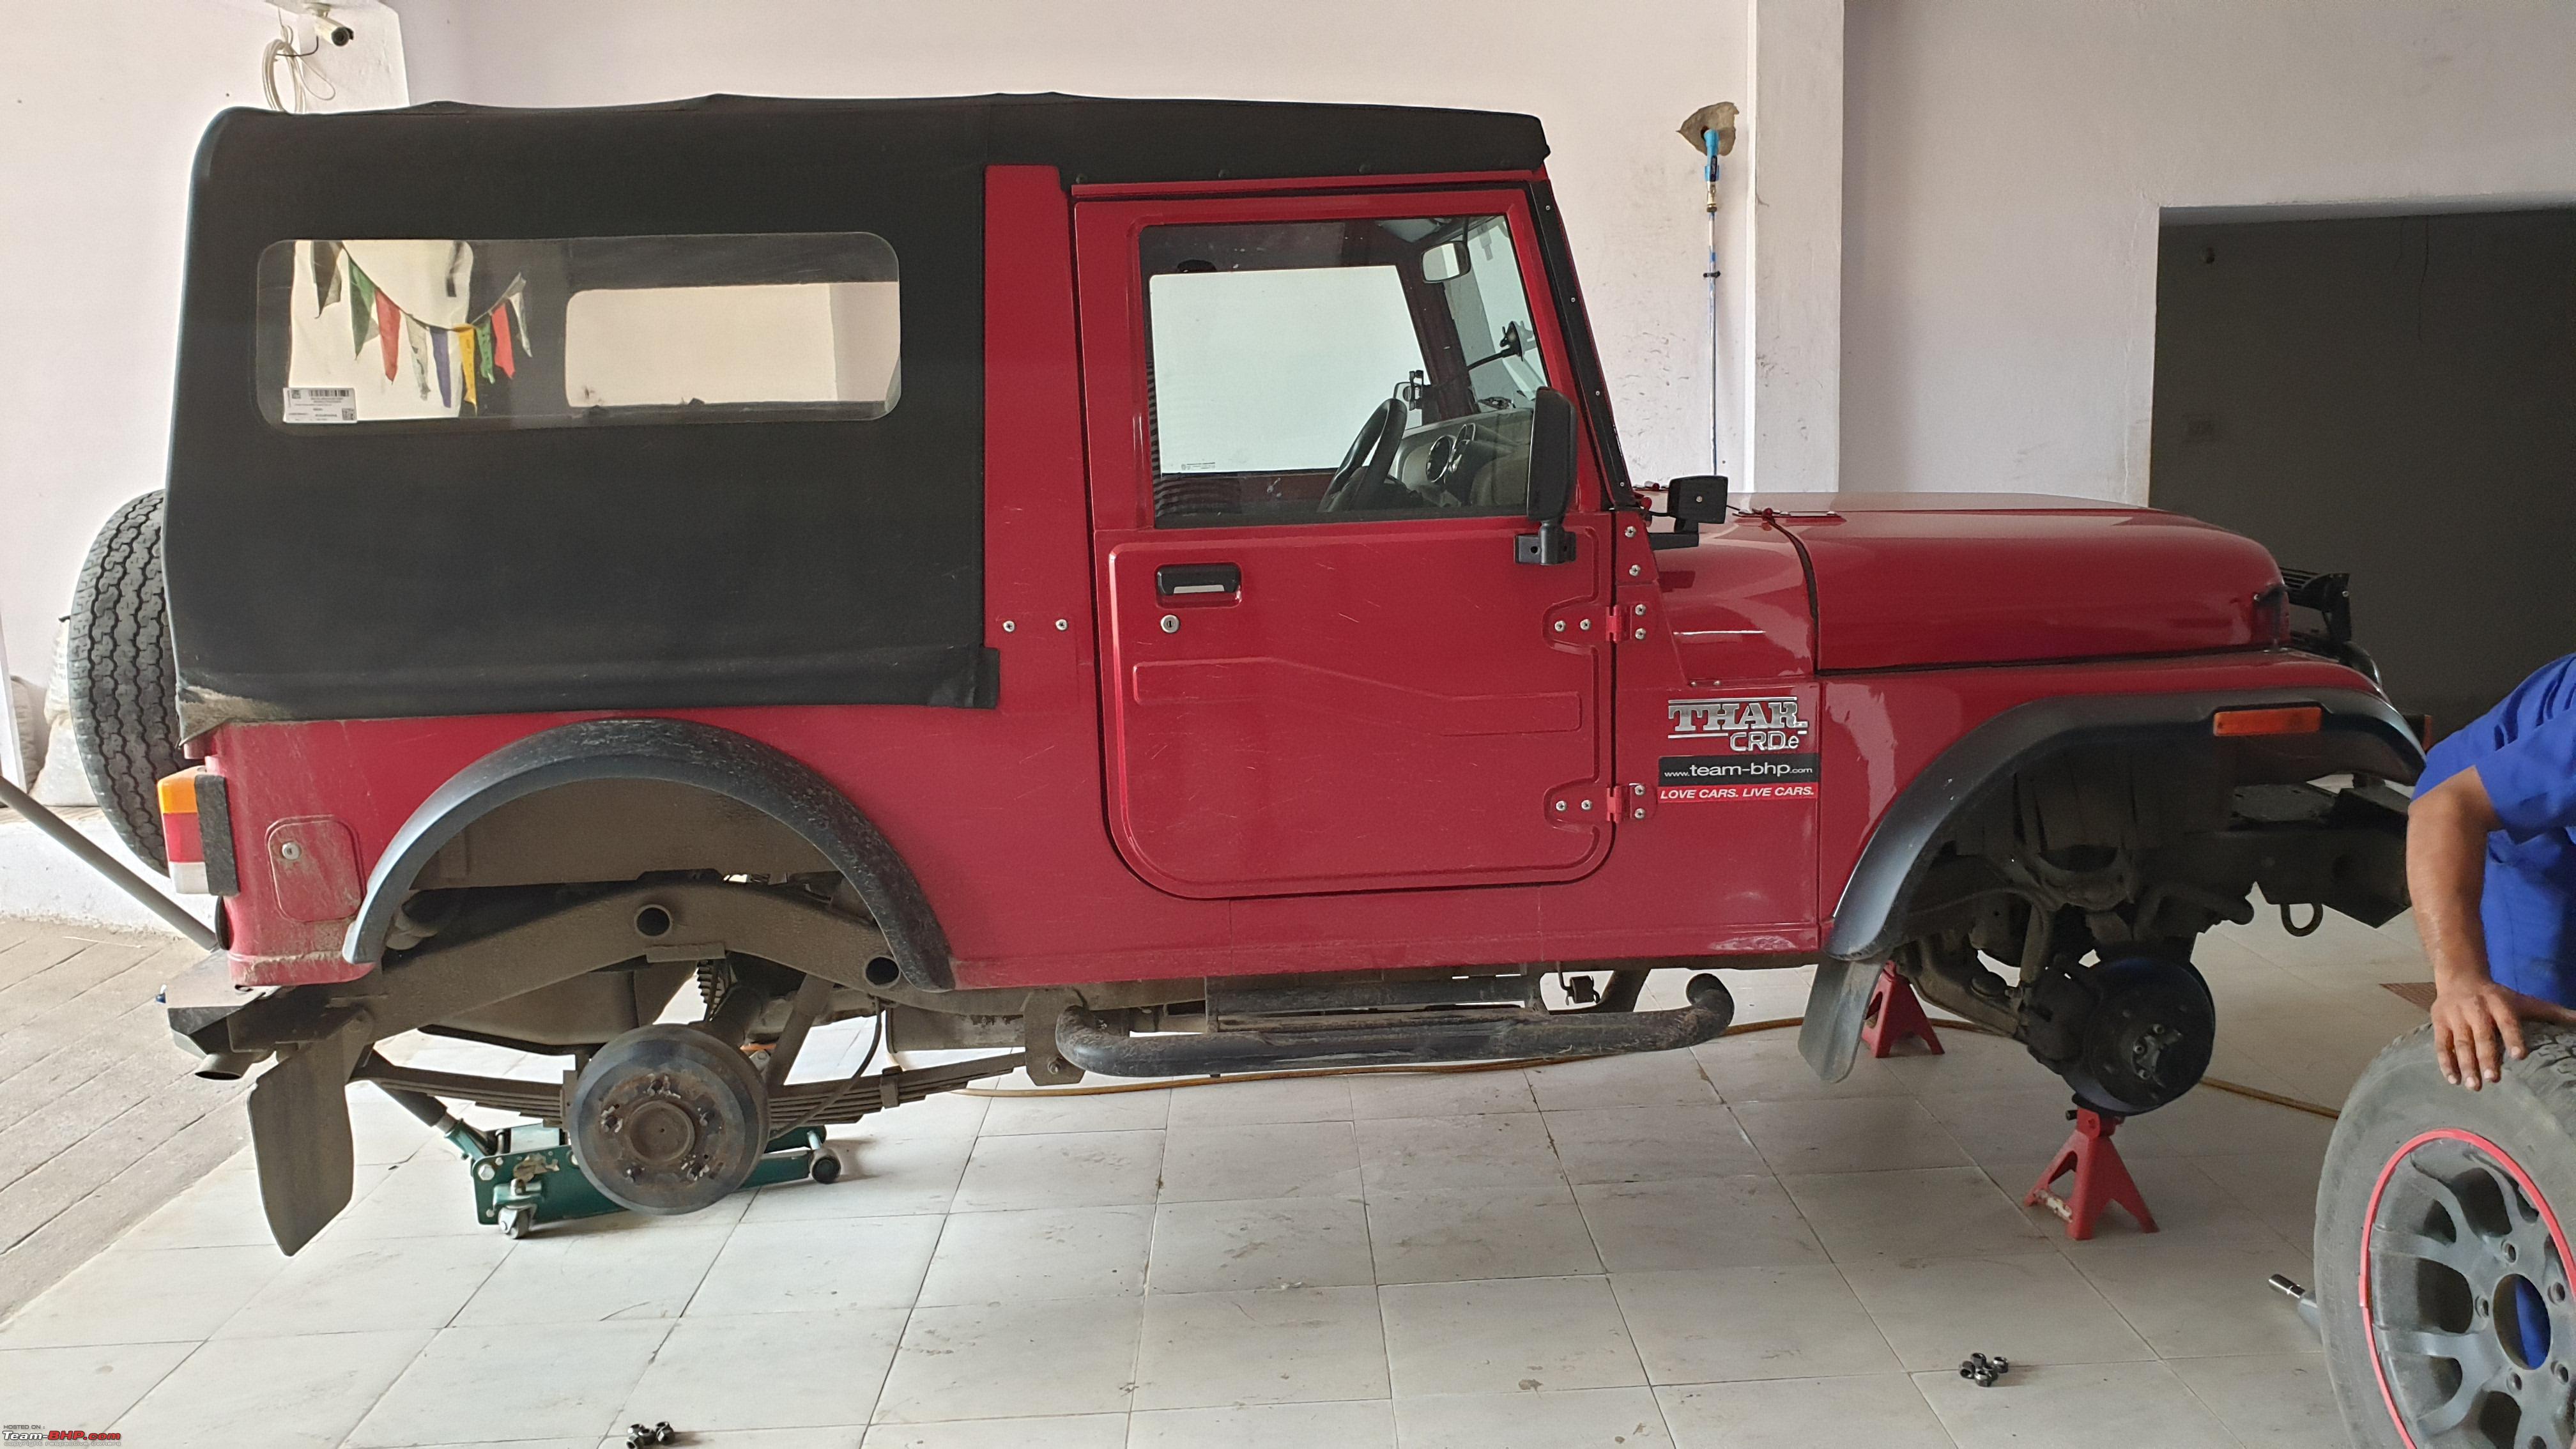 The Red Rhino - My Mahindra Thar CRDe 4x4 - Team-BHP